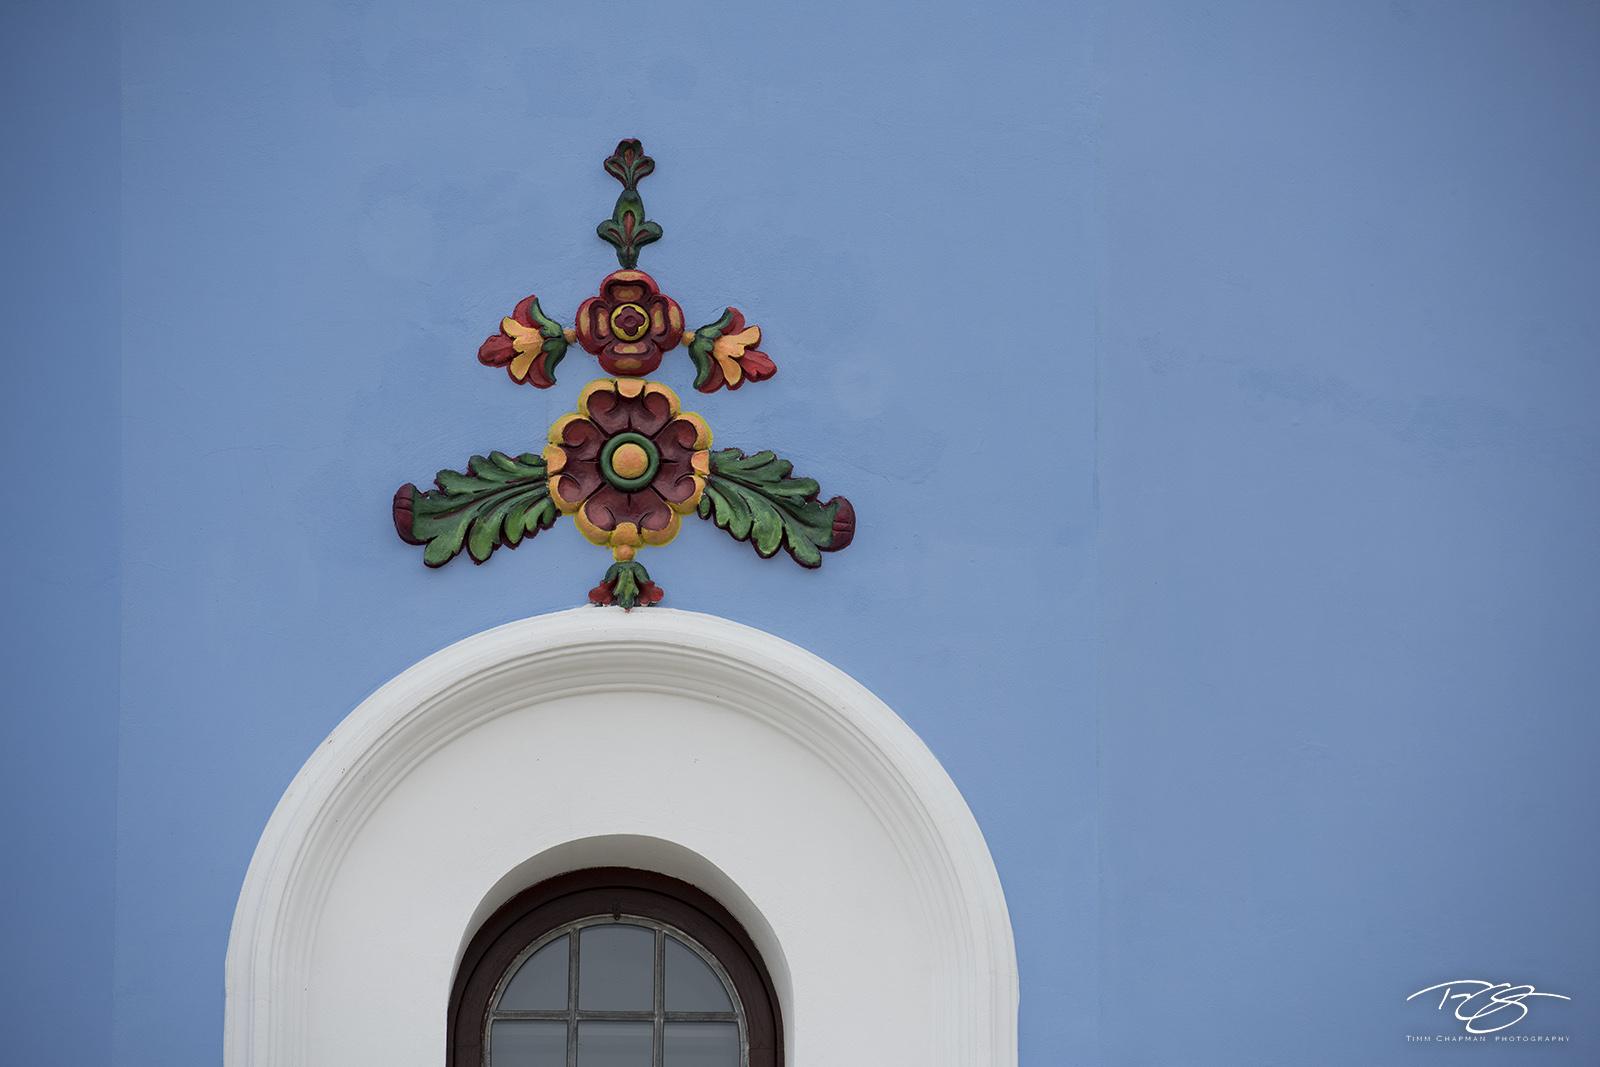 kiev, ukraine, window, arch, flowers, blue, kyiv, St. Michael's Golden-Domed Monastery, Mykhaylivs'kyi zolotoverkhyi monastyr, monastery, Podil, church, cathedral, photo